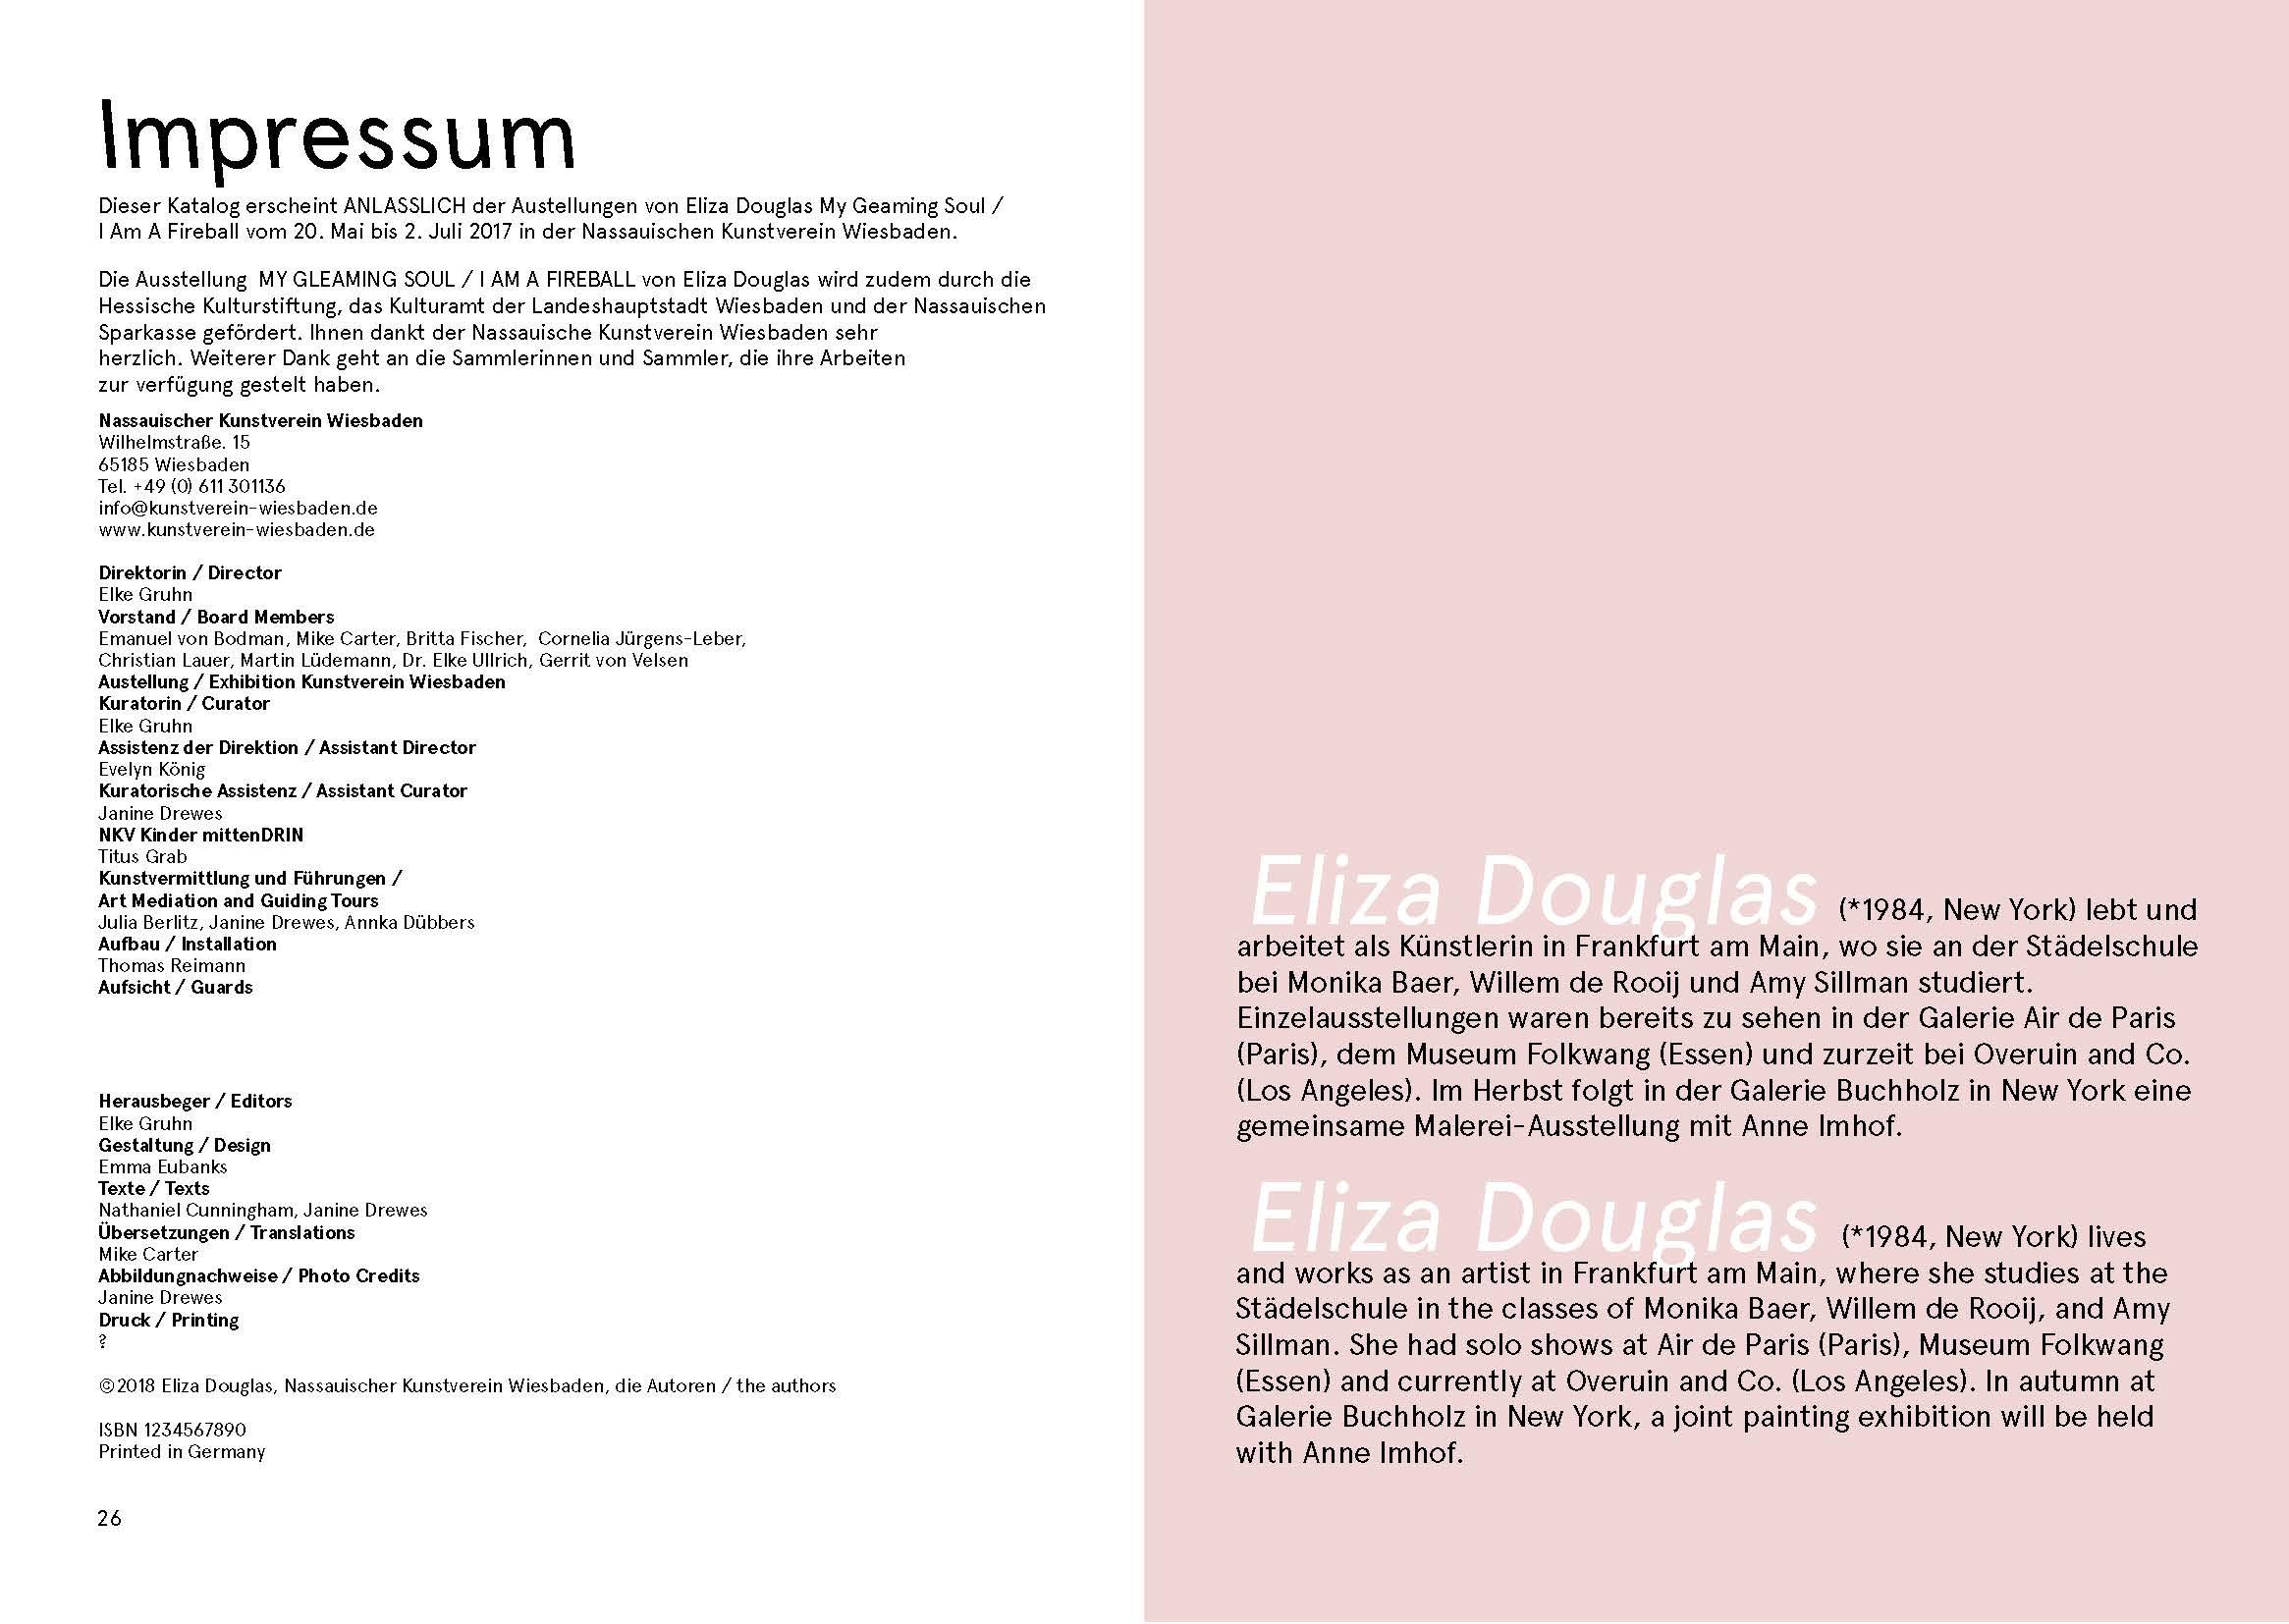 Eliza Douglas Exhibition Publication Impressum